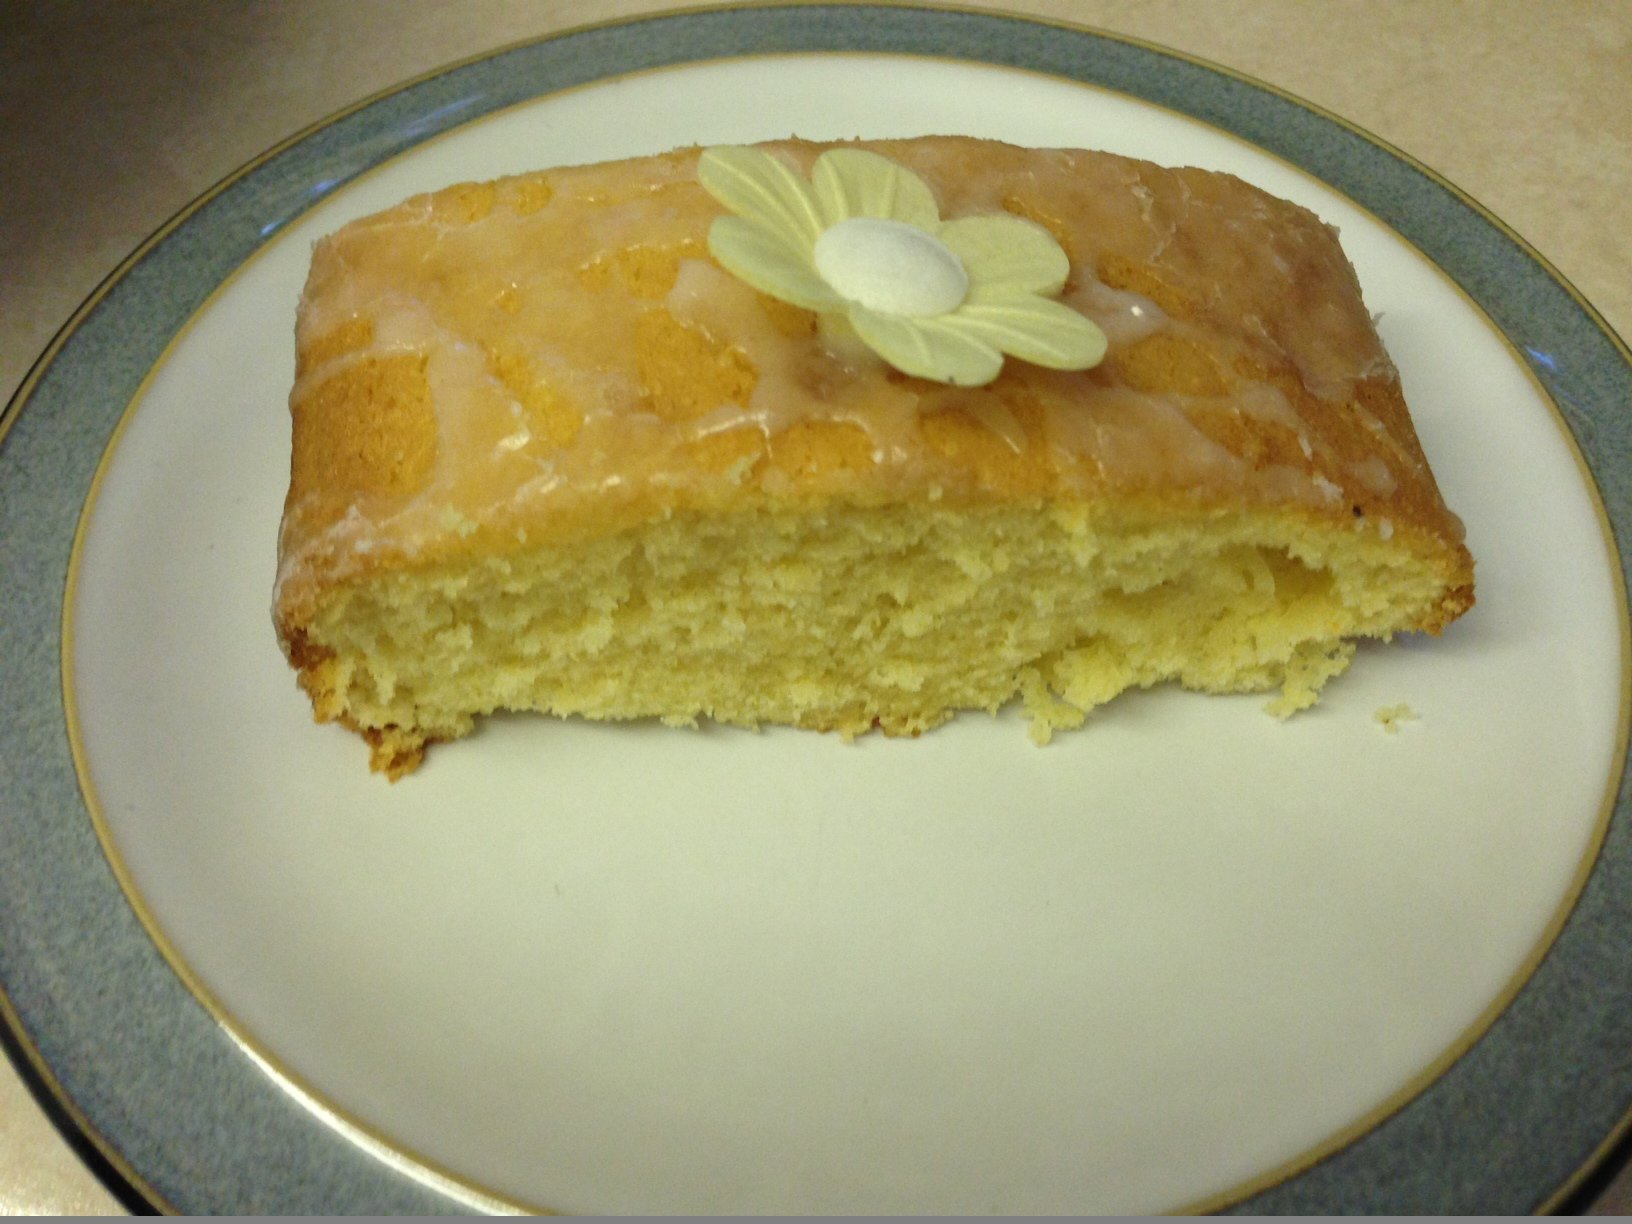 Barefoot Contessa Lemon Drizzle Cake